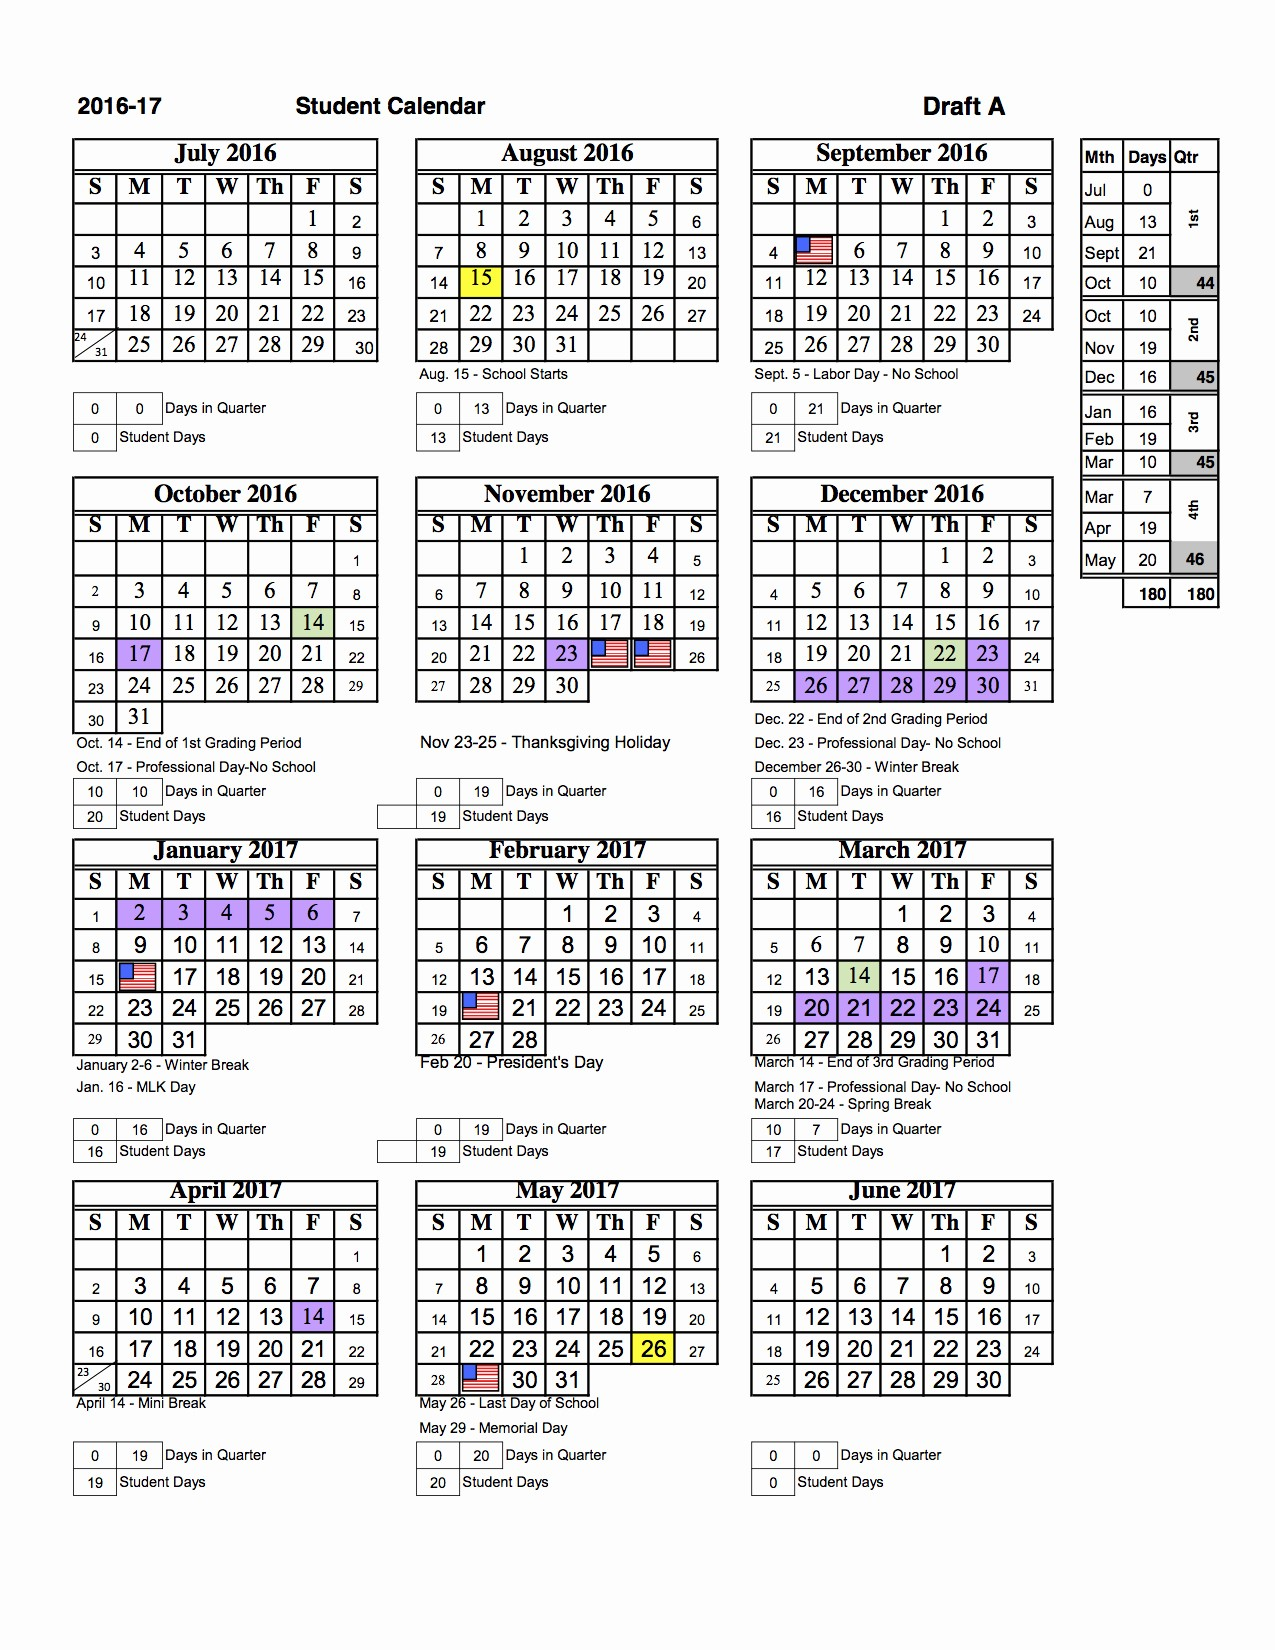 Calendar 2016-17 Template Fresh Sarasota County Students Will Return to Classes Earlier